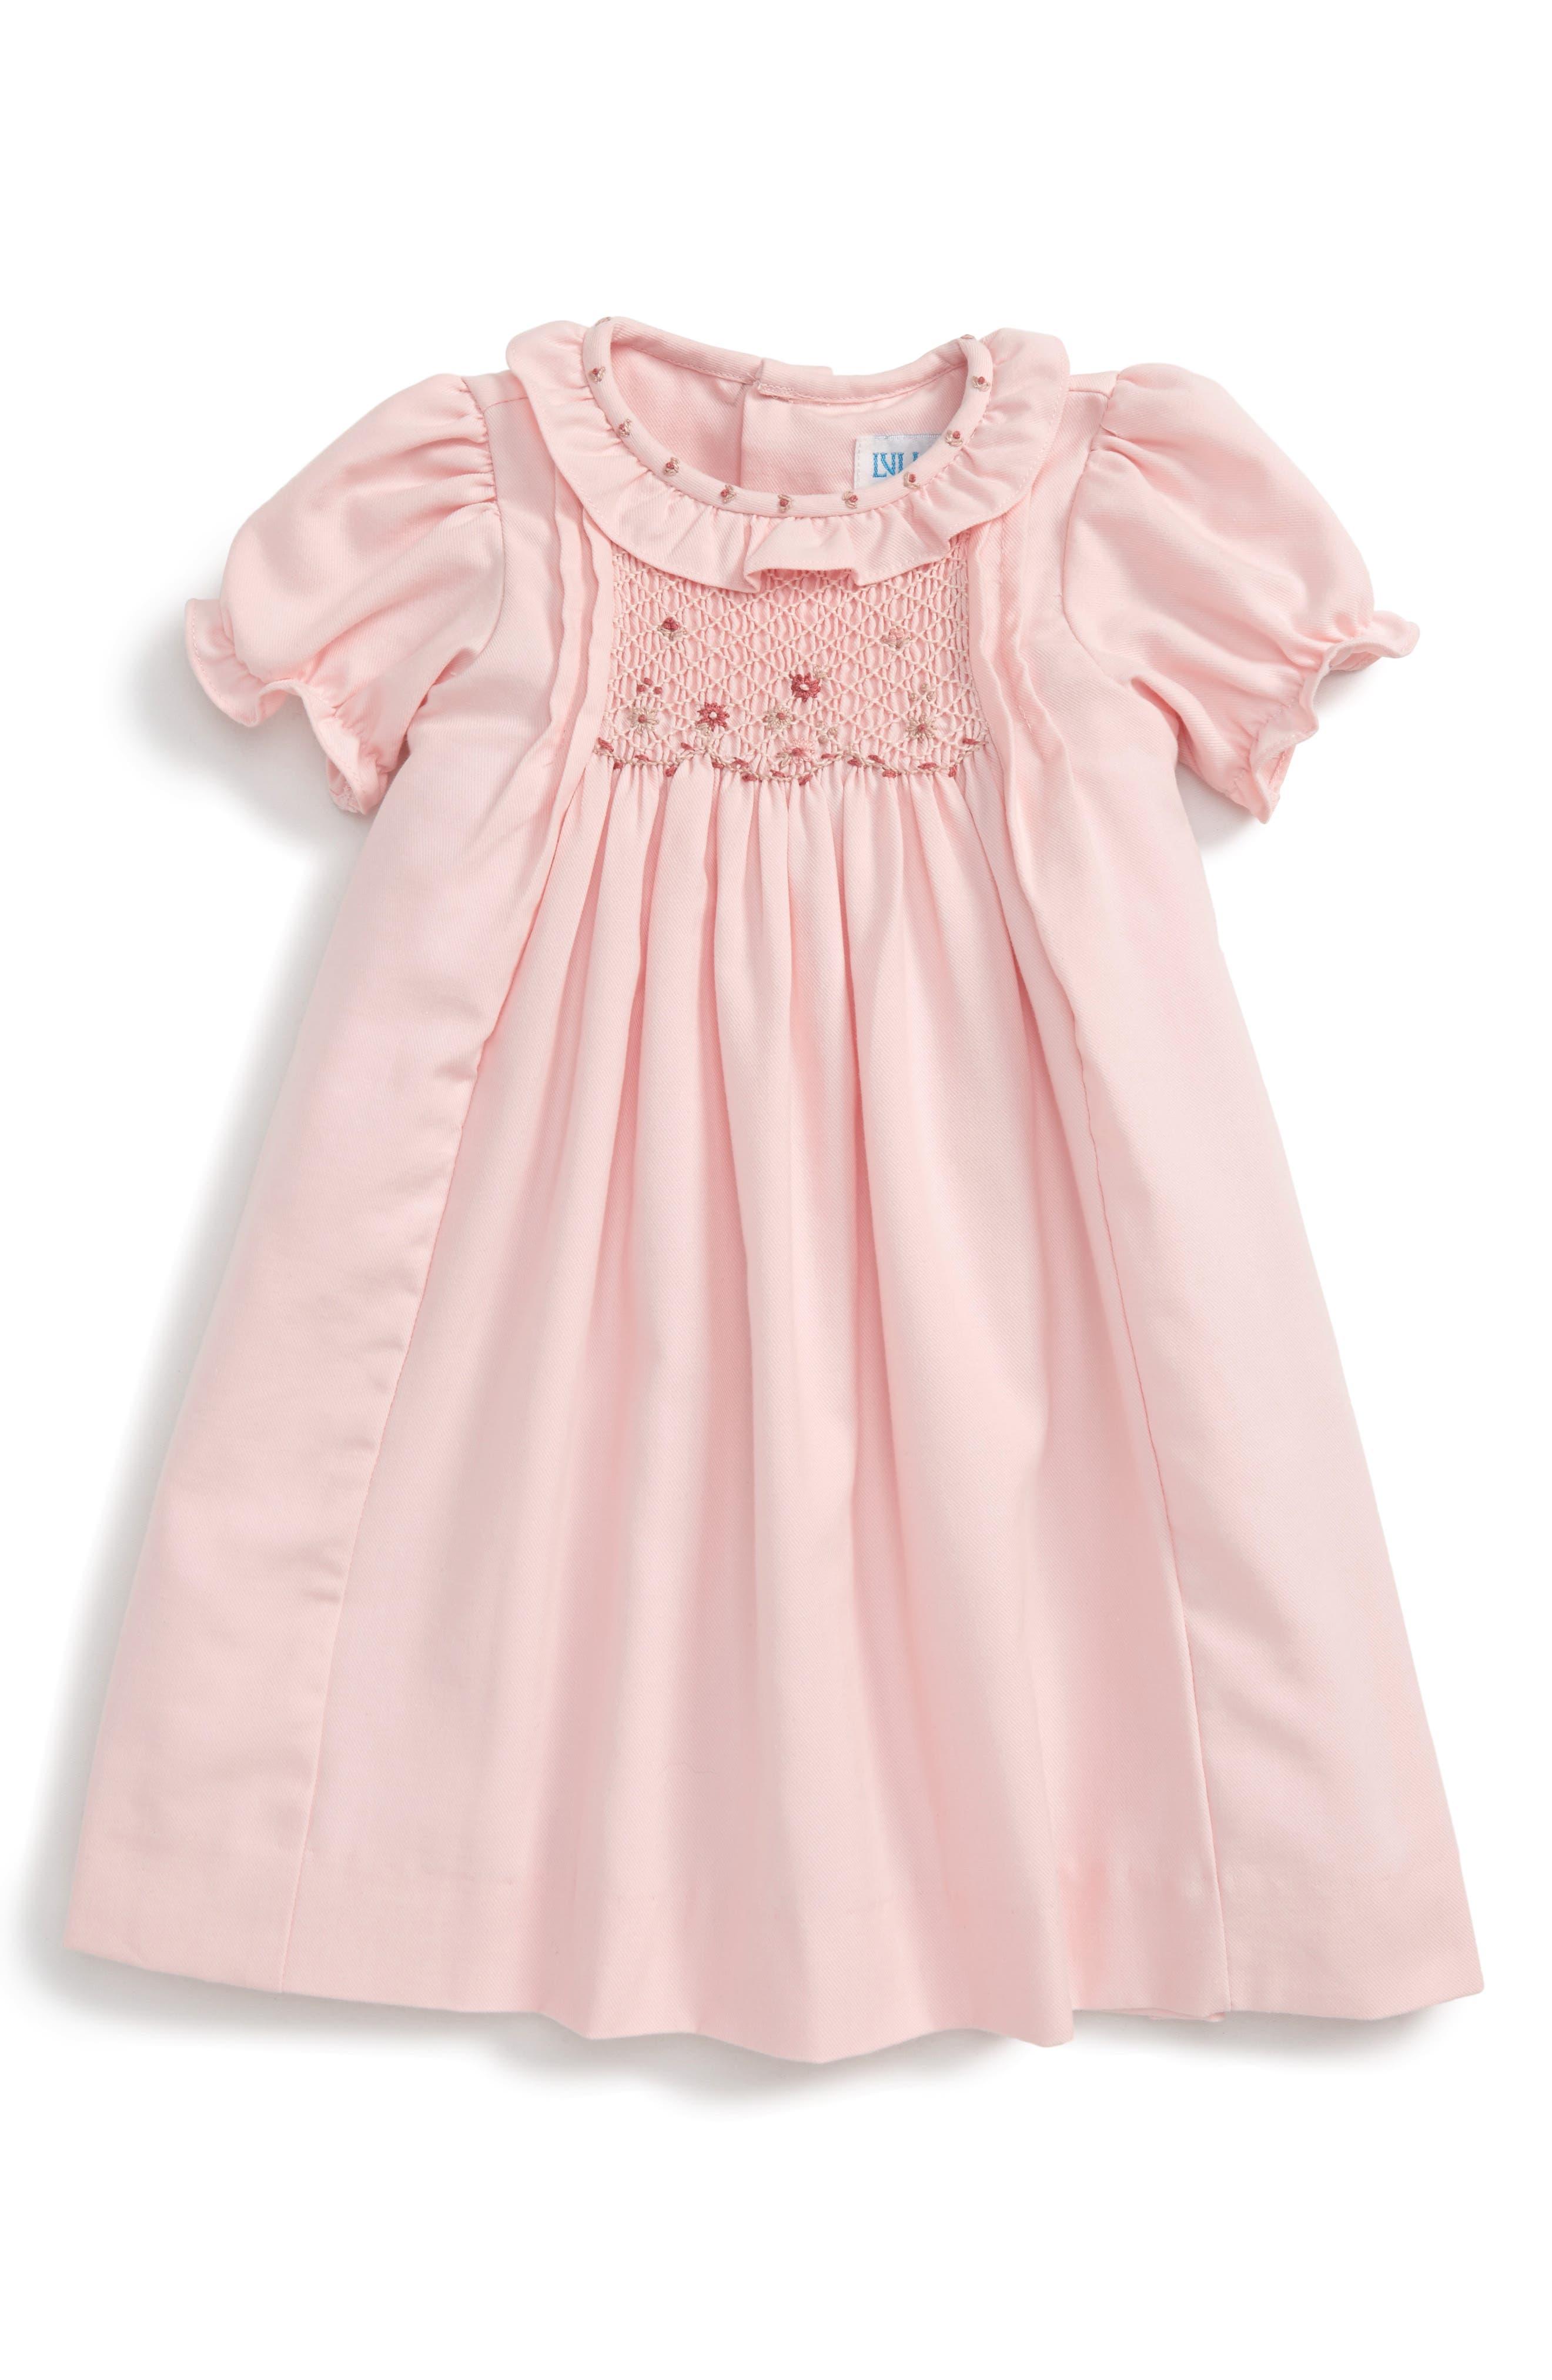 LULI & ME Viyella Smocked Dress, Main, color, 650